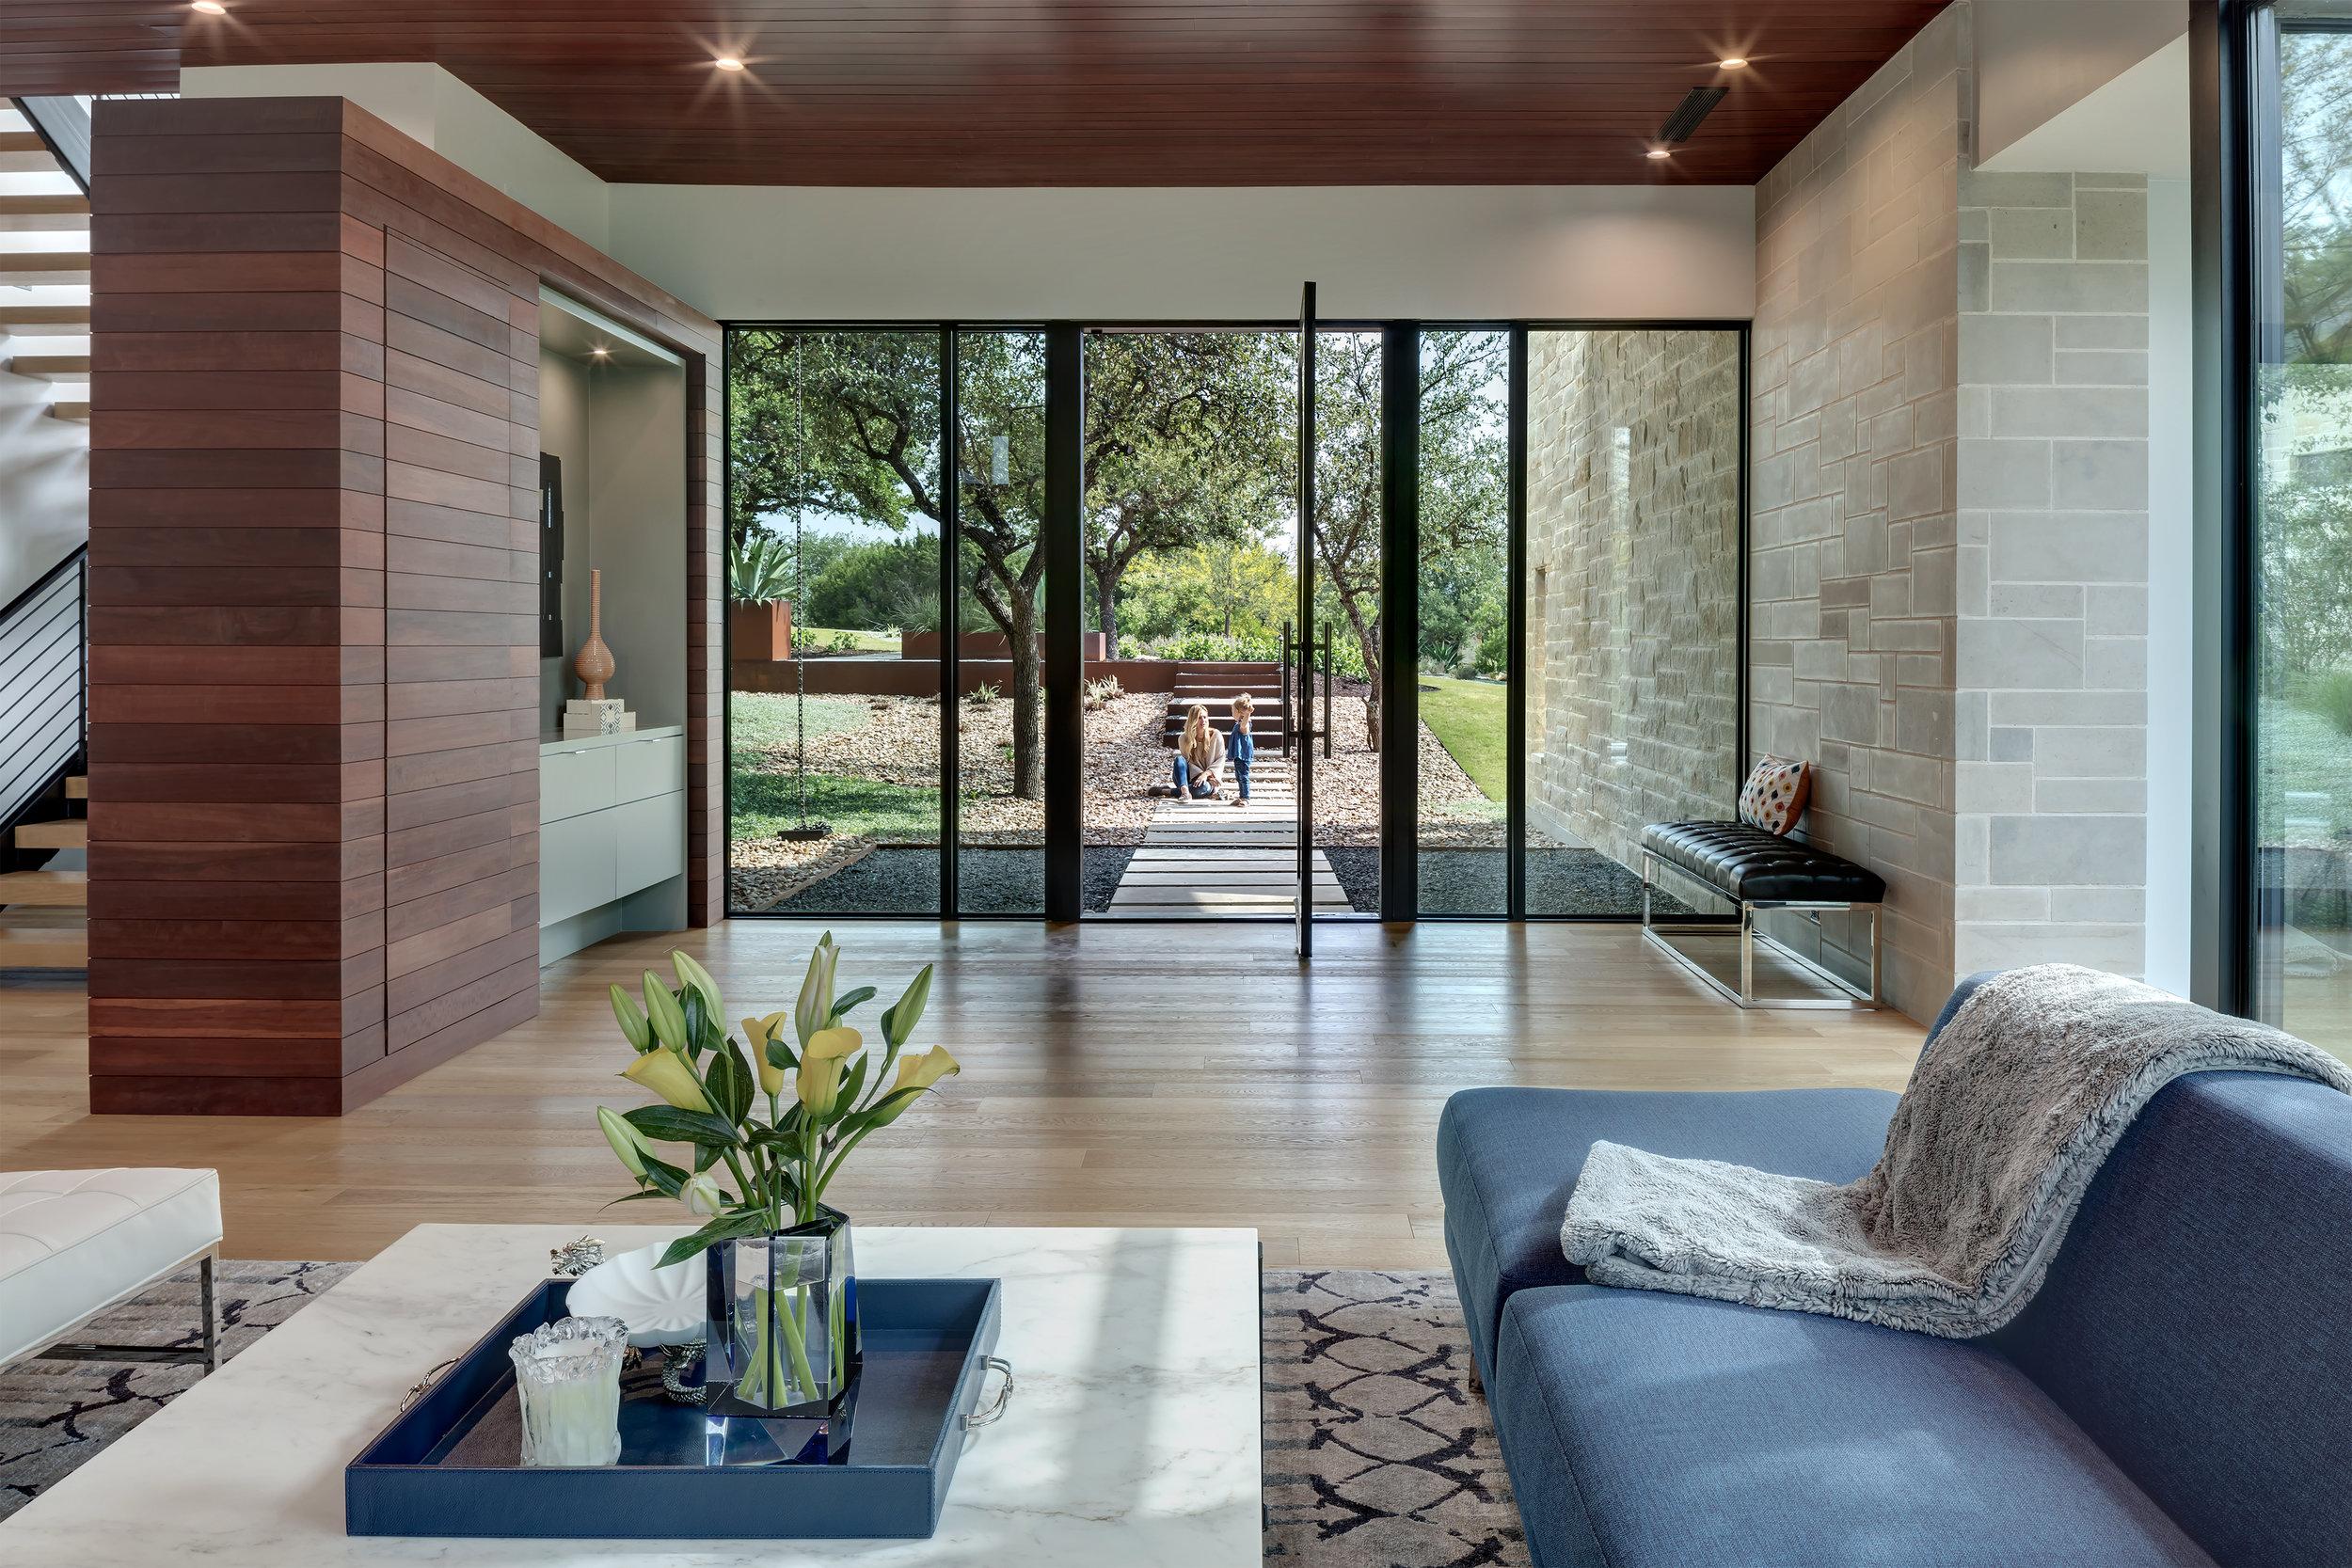 Matt Fajkus MF Architecture_Control-Shift House_Interior Photo 2 by Charles Davis Smith.jpg